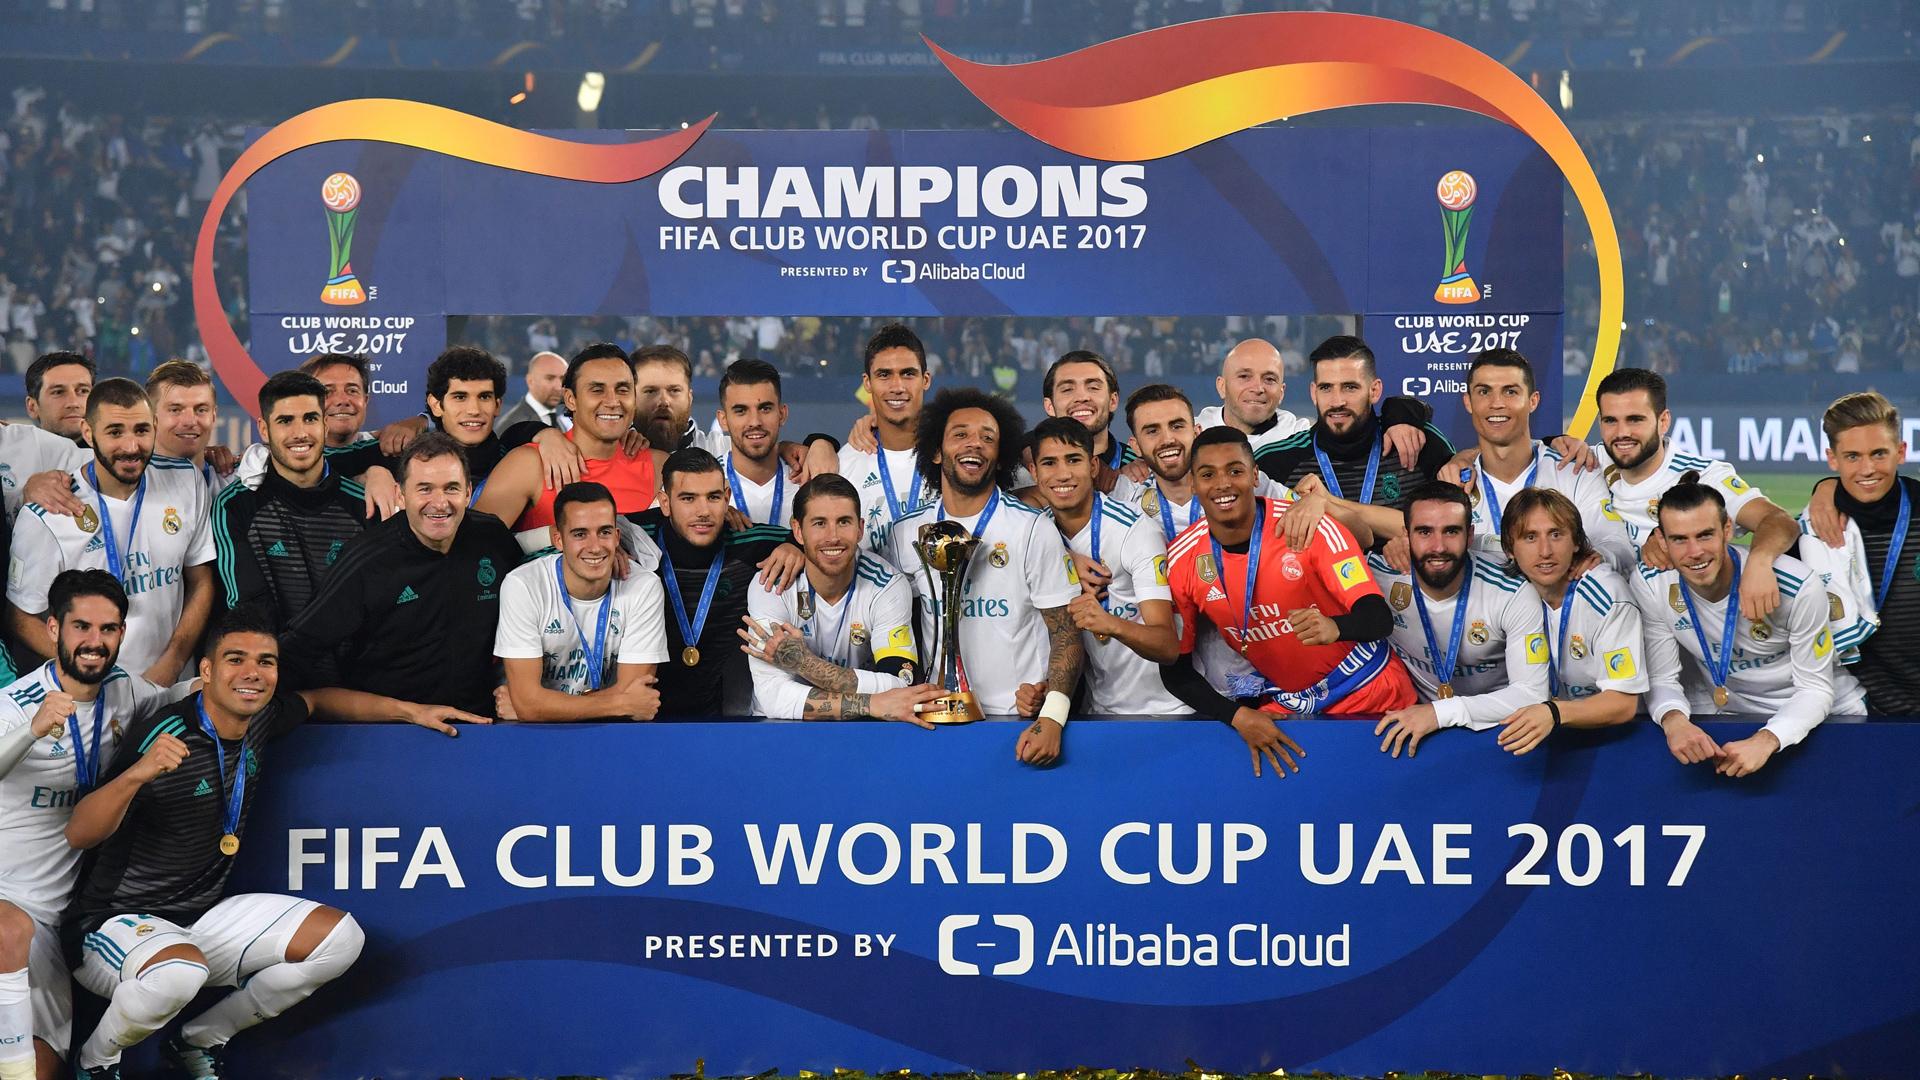 Piala Dunia Antarklub FIFA Digelar 11 21 Desember 2019